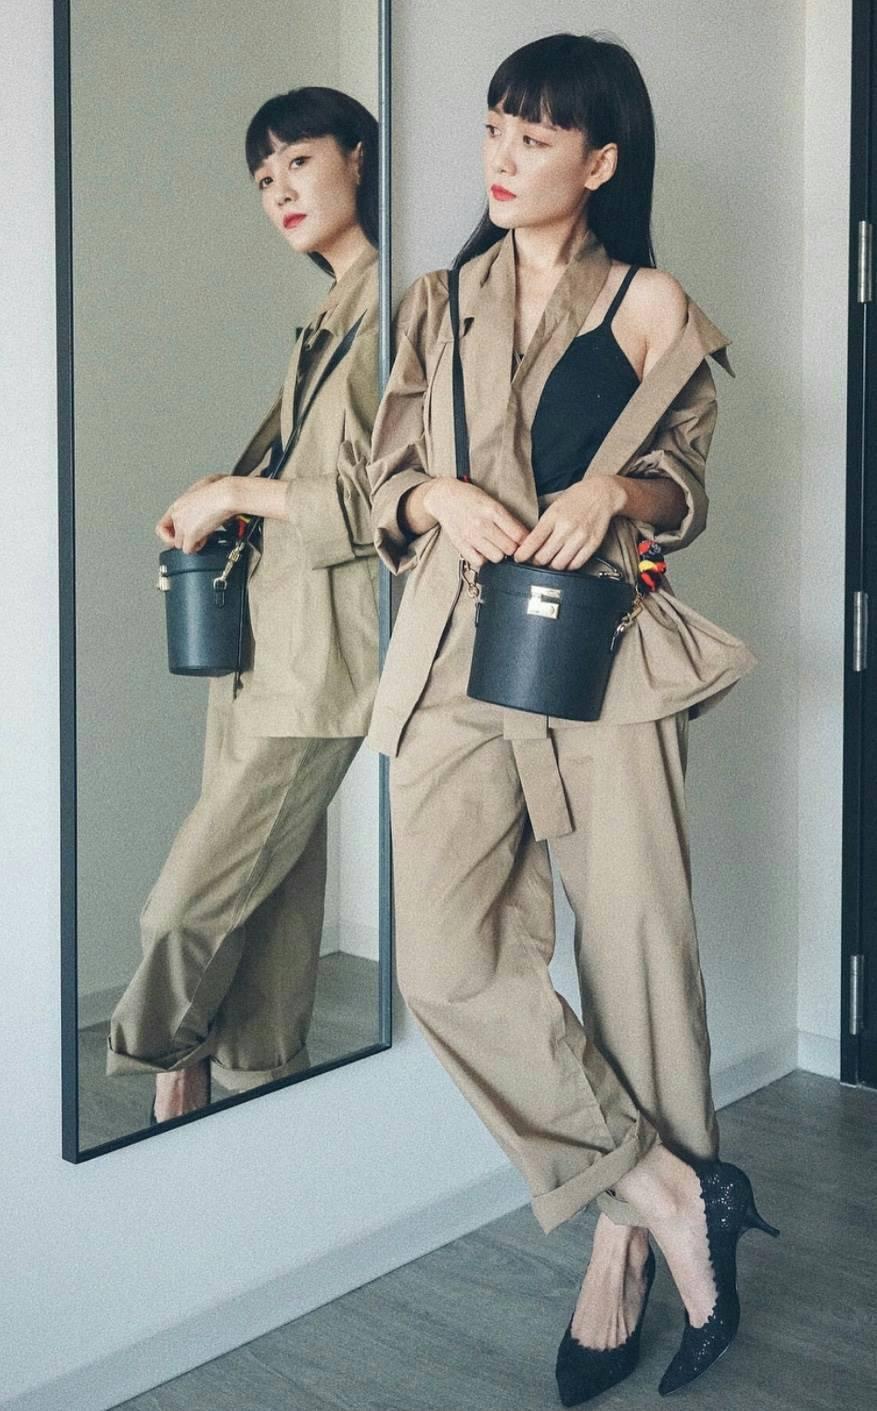 CHARLES & KEITH Handbag Disney Tsum Tsum Collection 2018 free ถุงผ้า *สินค้า Outlet